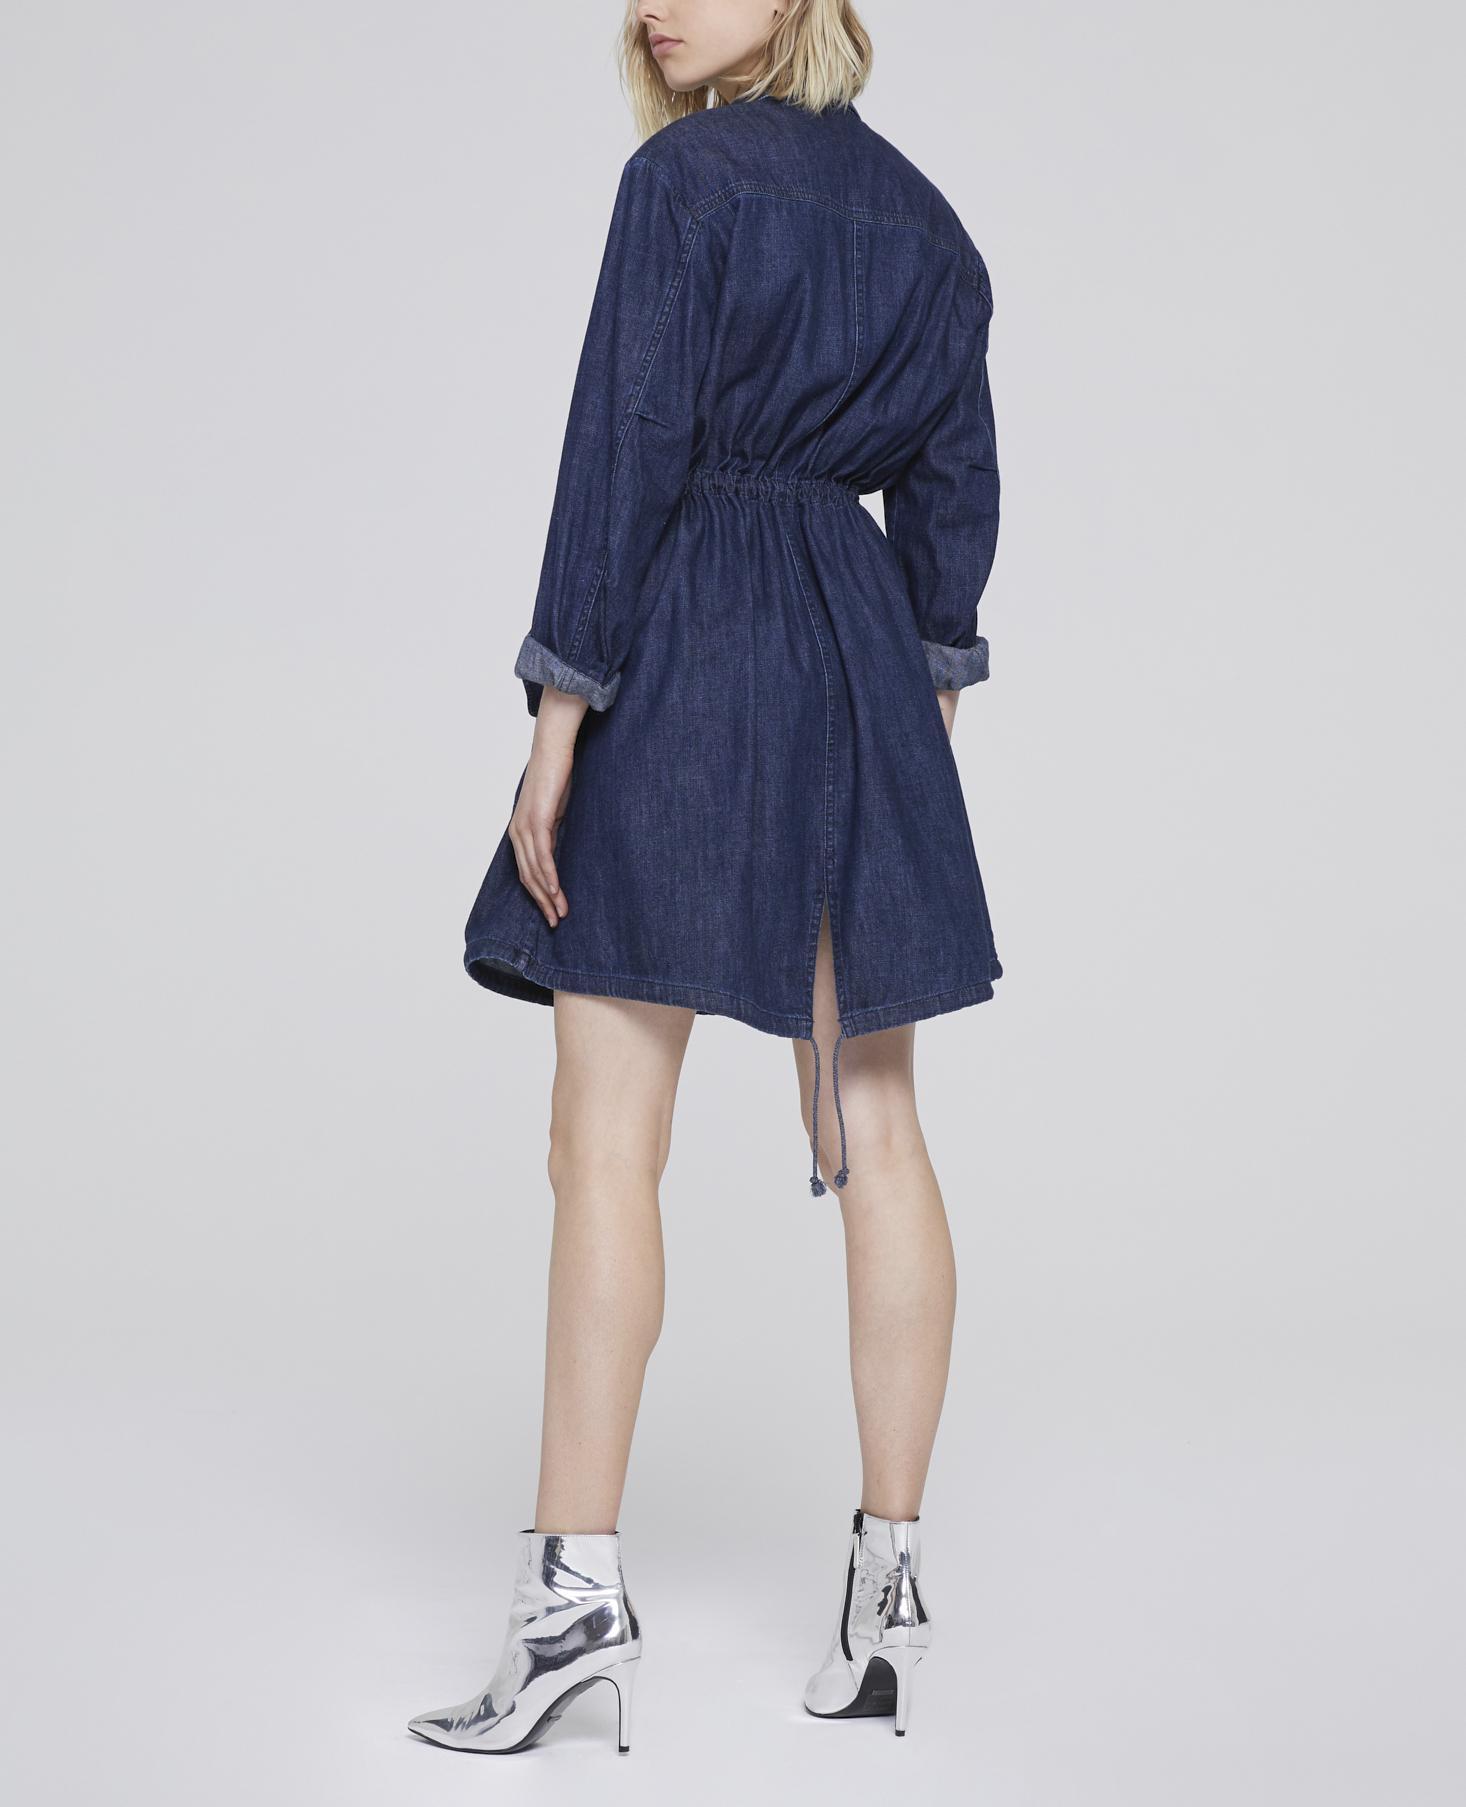 The Pause Parka Dress